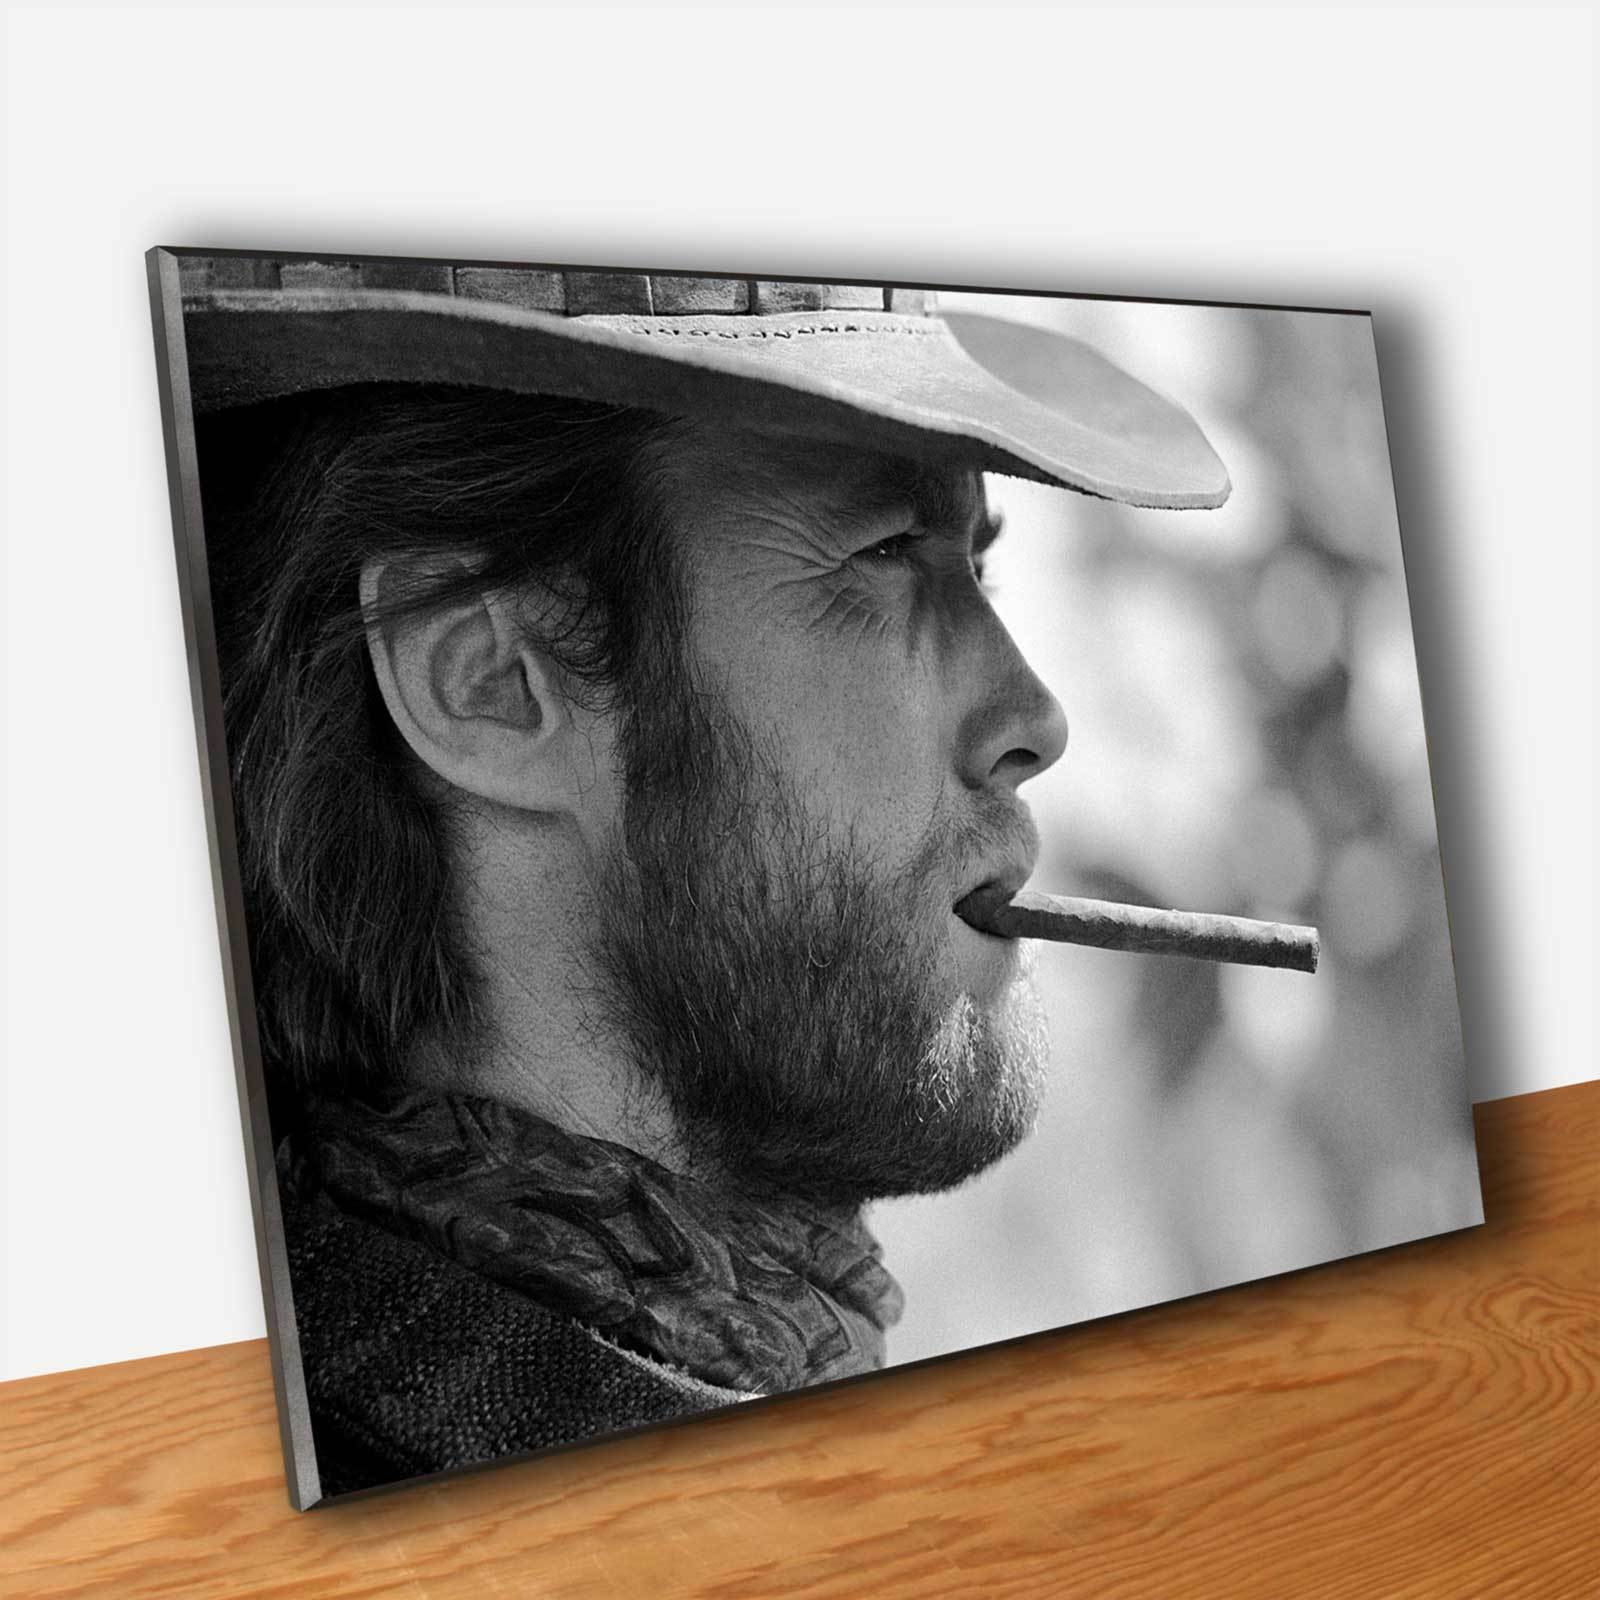 Poster Film Western Clint Eastwood - Stampa Fine Kunst Quadro su Pannello MDF